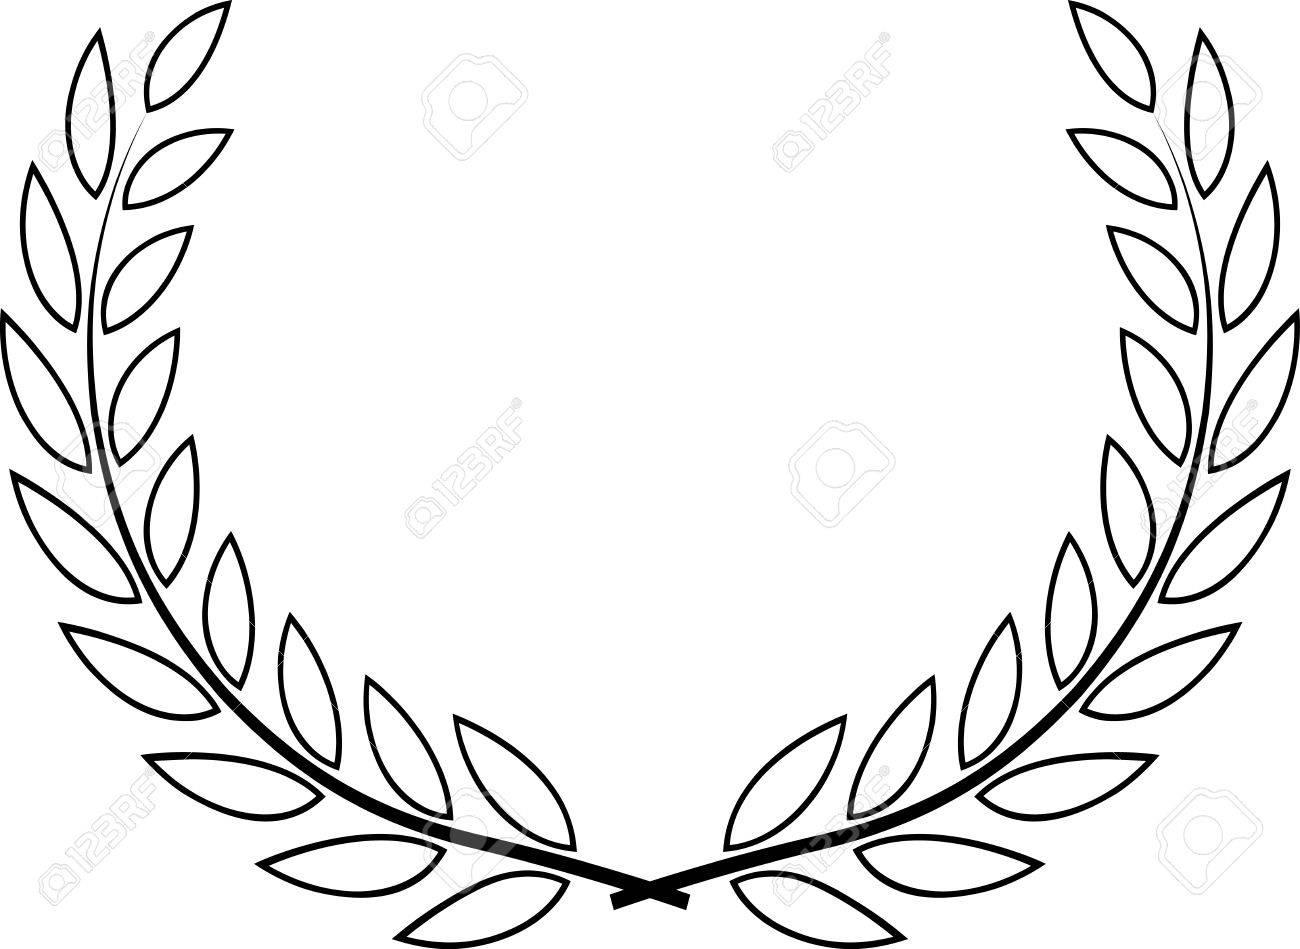 Laurel Wreath Drawing At Getdrawings